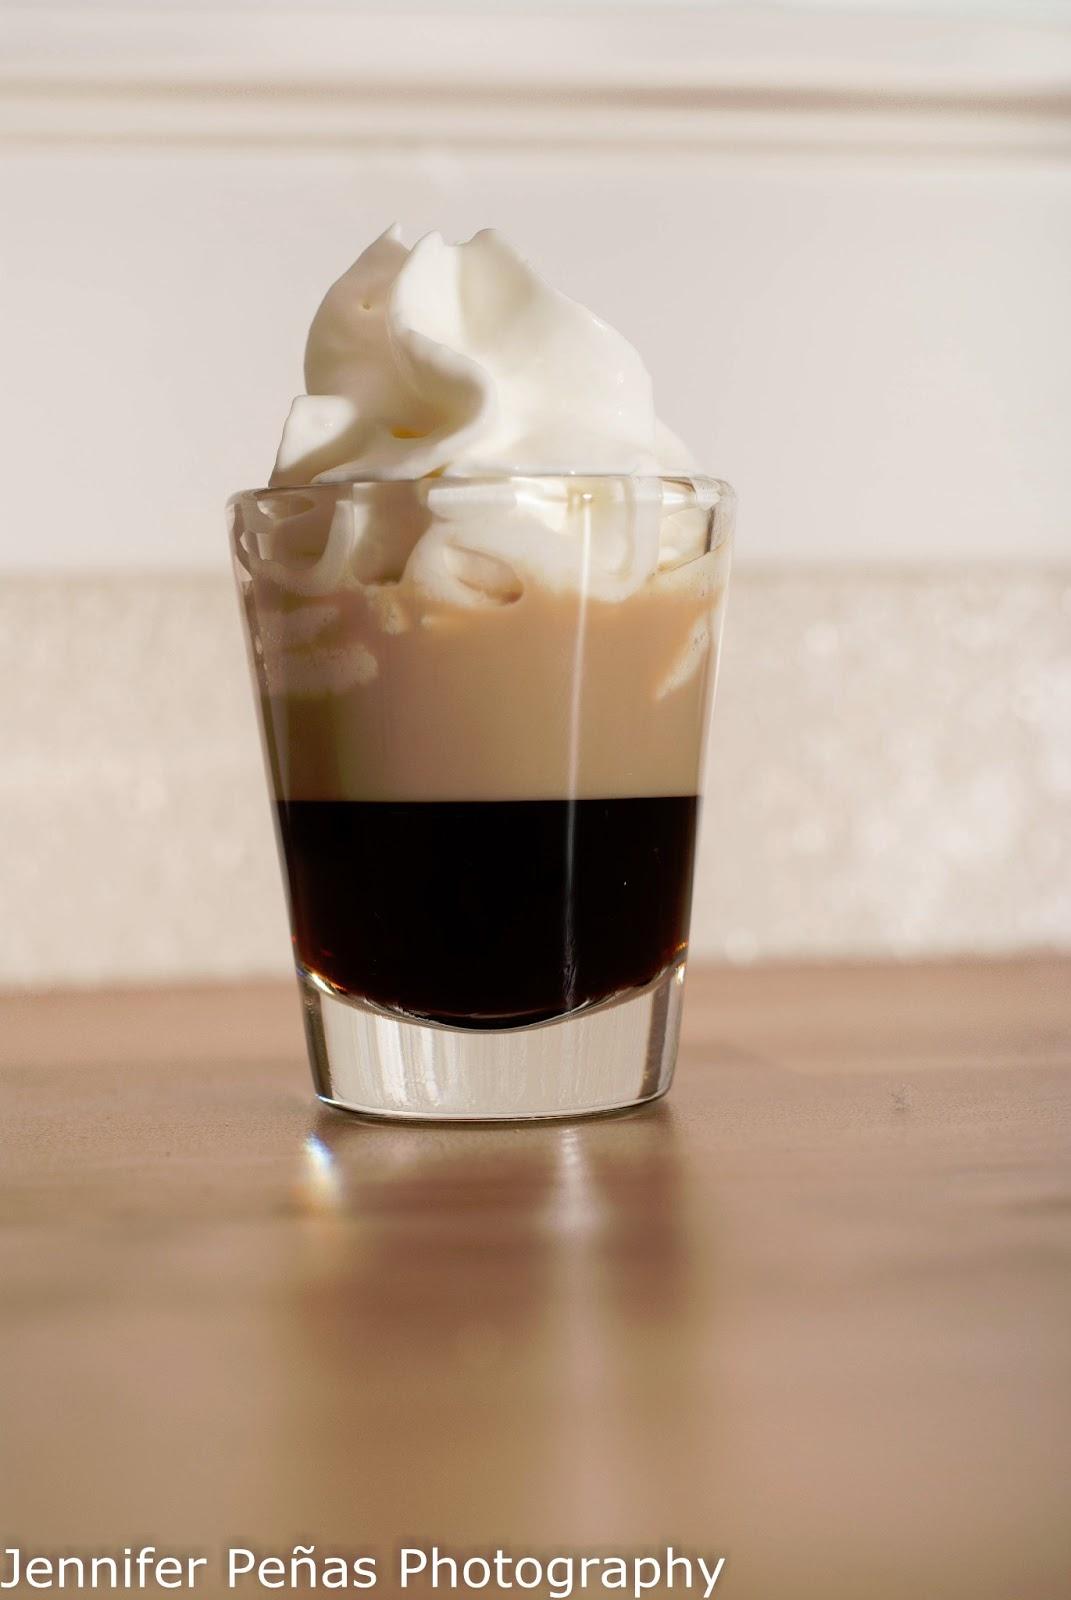 Fotó: drinkswap.com